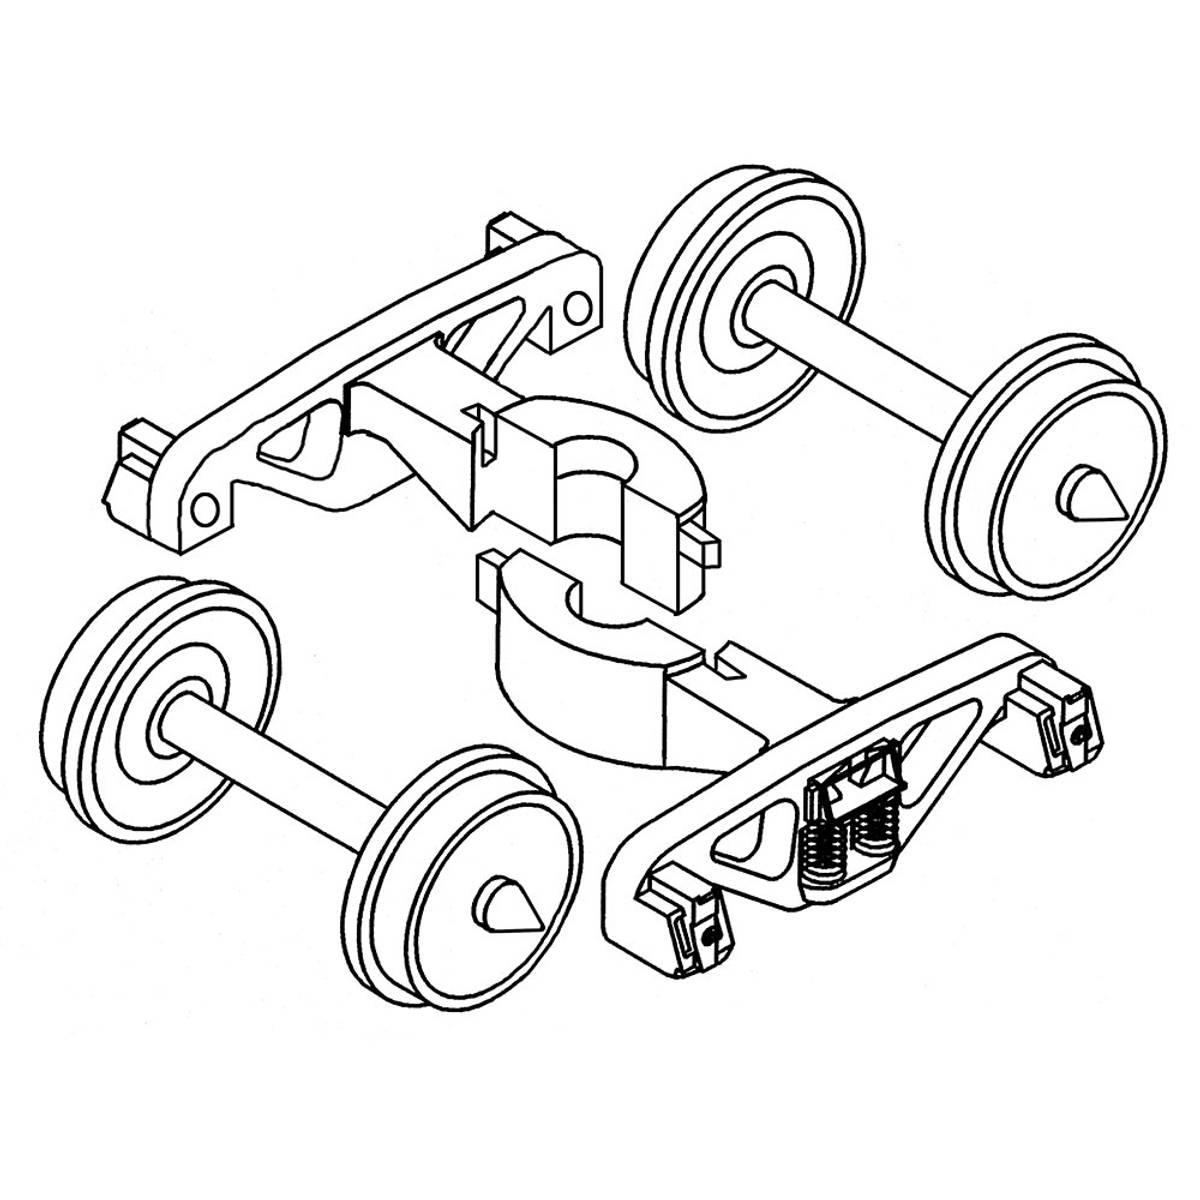 Kadee - H0n3 Arch Bar Trucks 3' 7